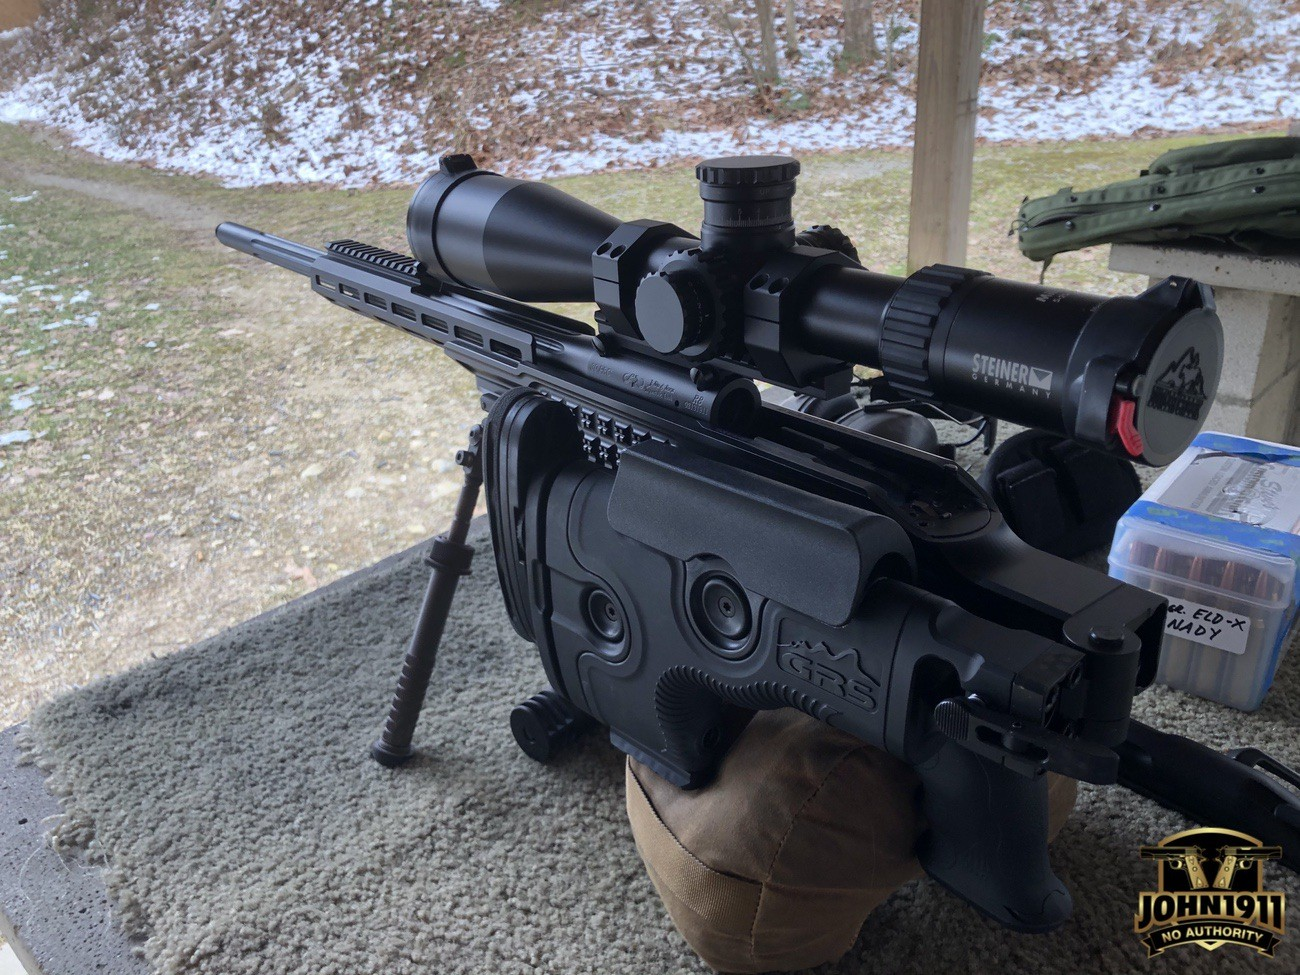 POTD - Bore Sighting a Rifle